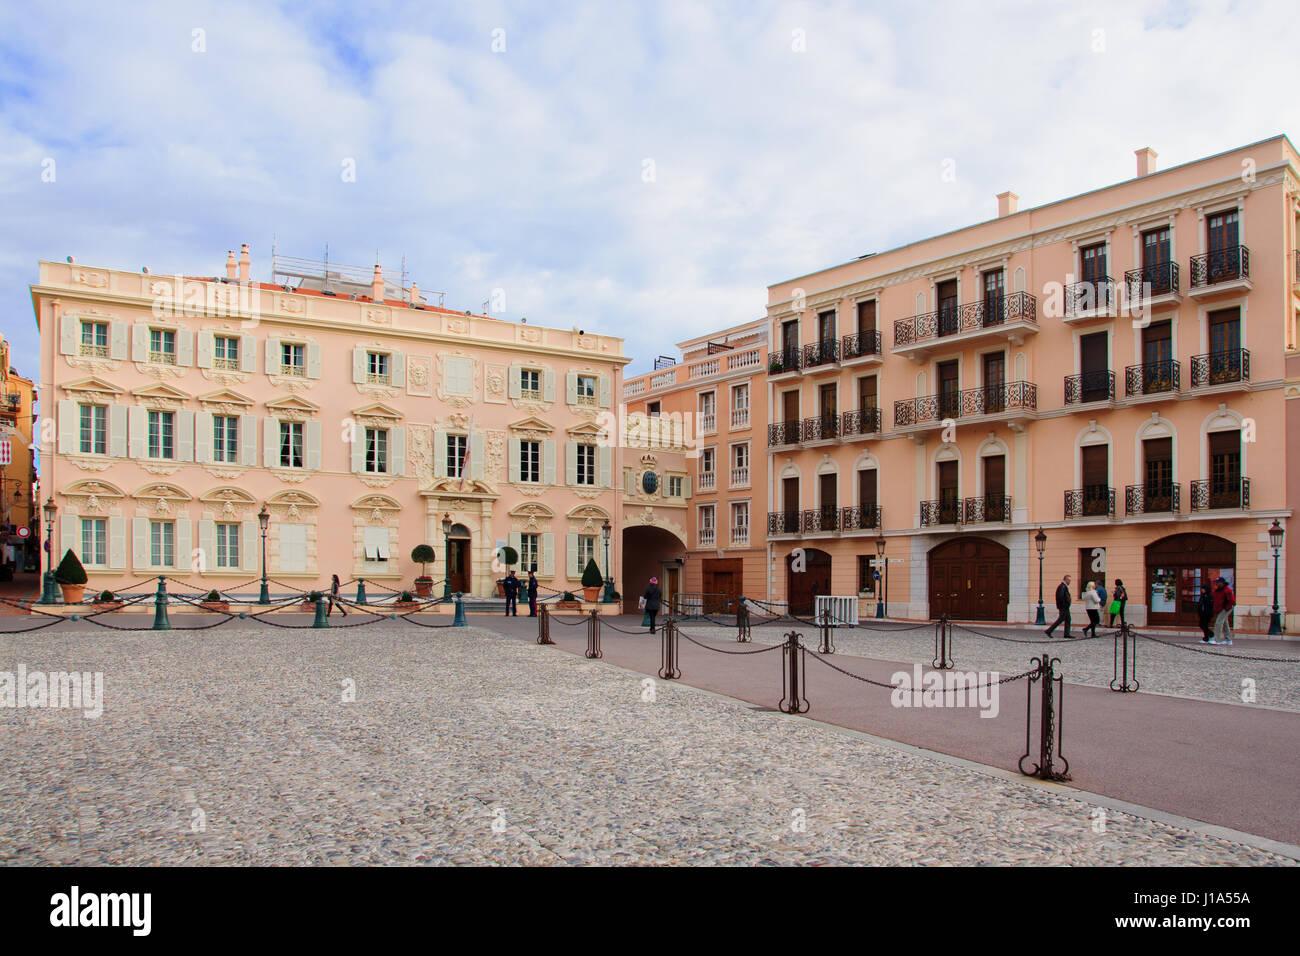 MONACO-VILLE, MONACO - JAN 26, 2015: Scene of the Place du Palais square (palace square) in Monaco-Ville, Monaco - Stock Image